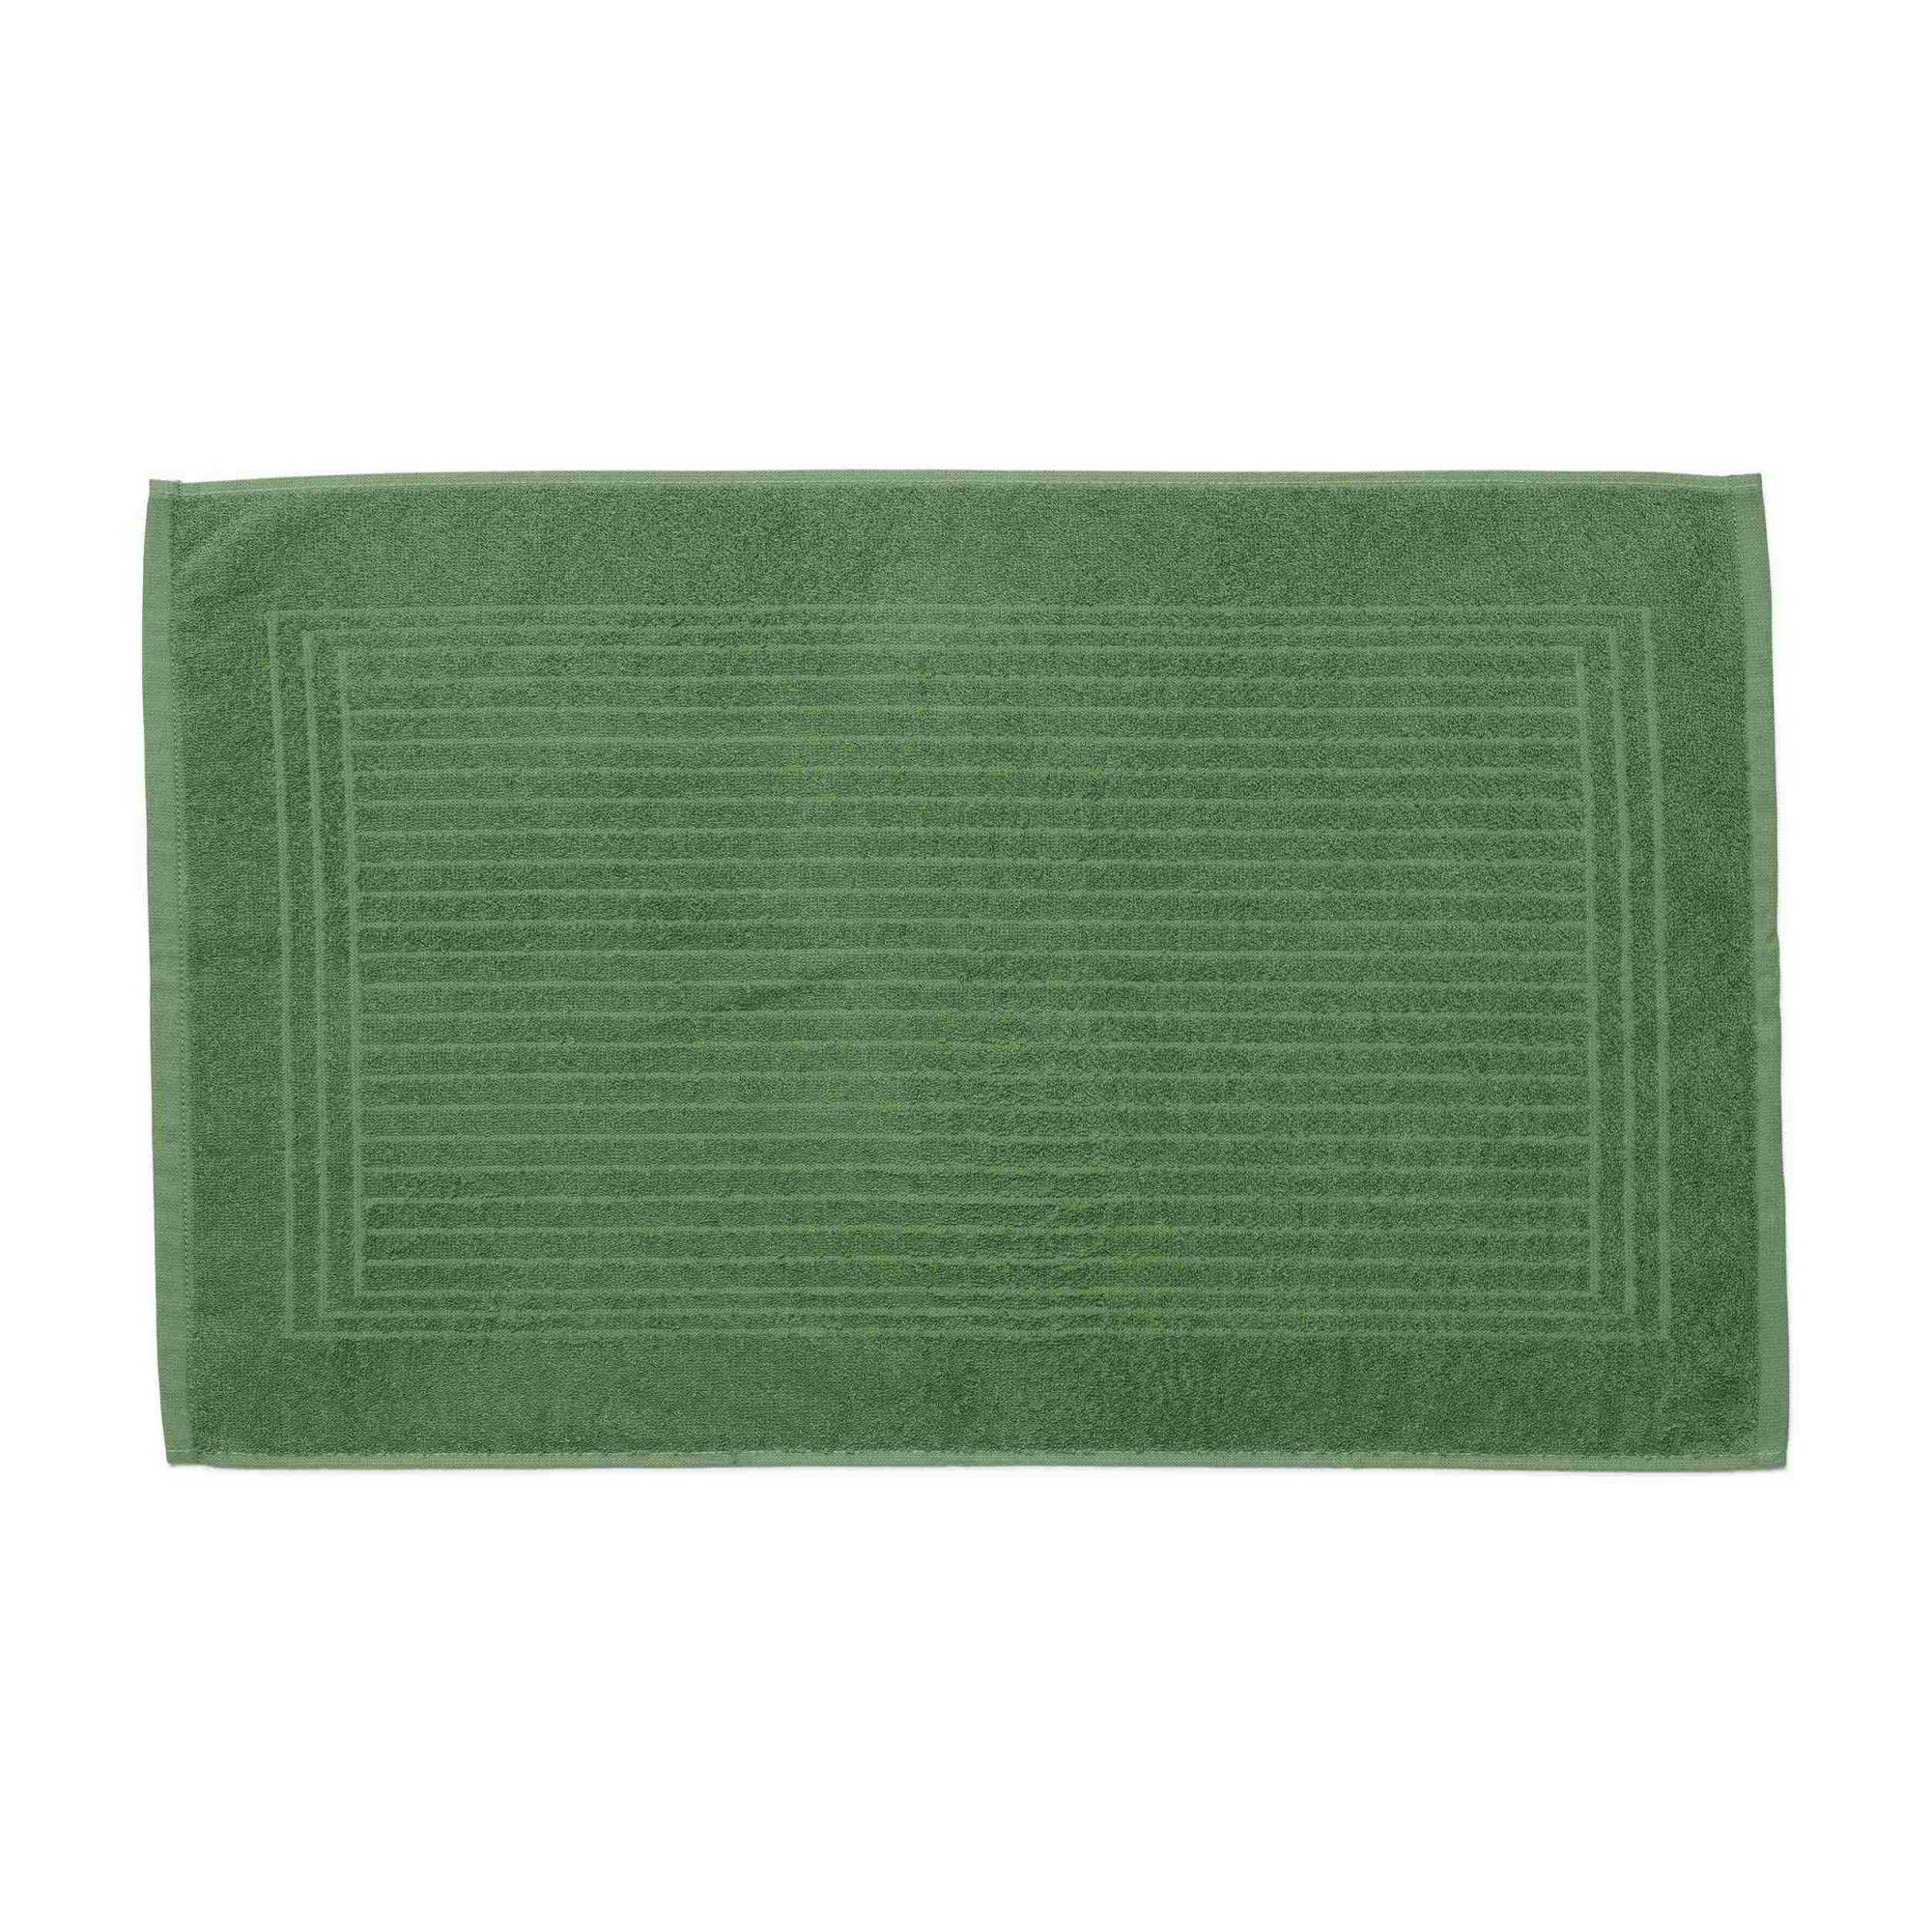 Piso cedro santista verde 100% algodao